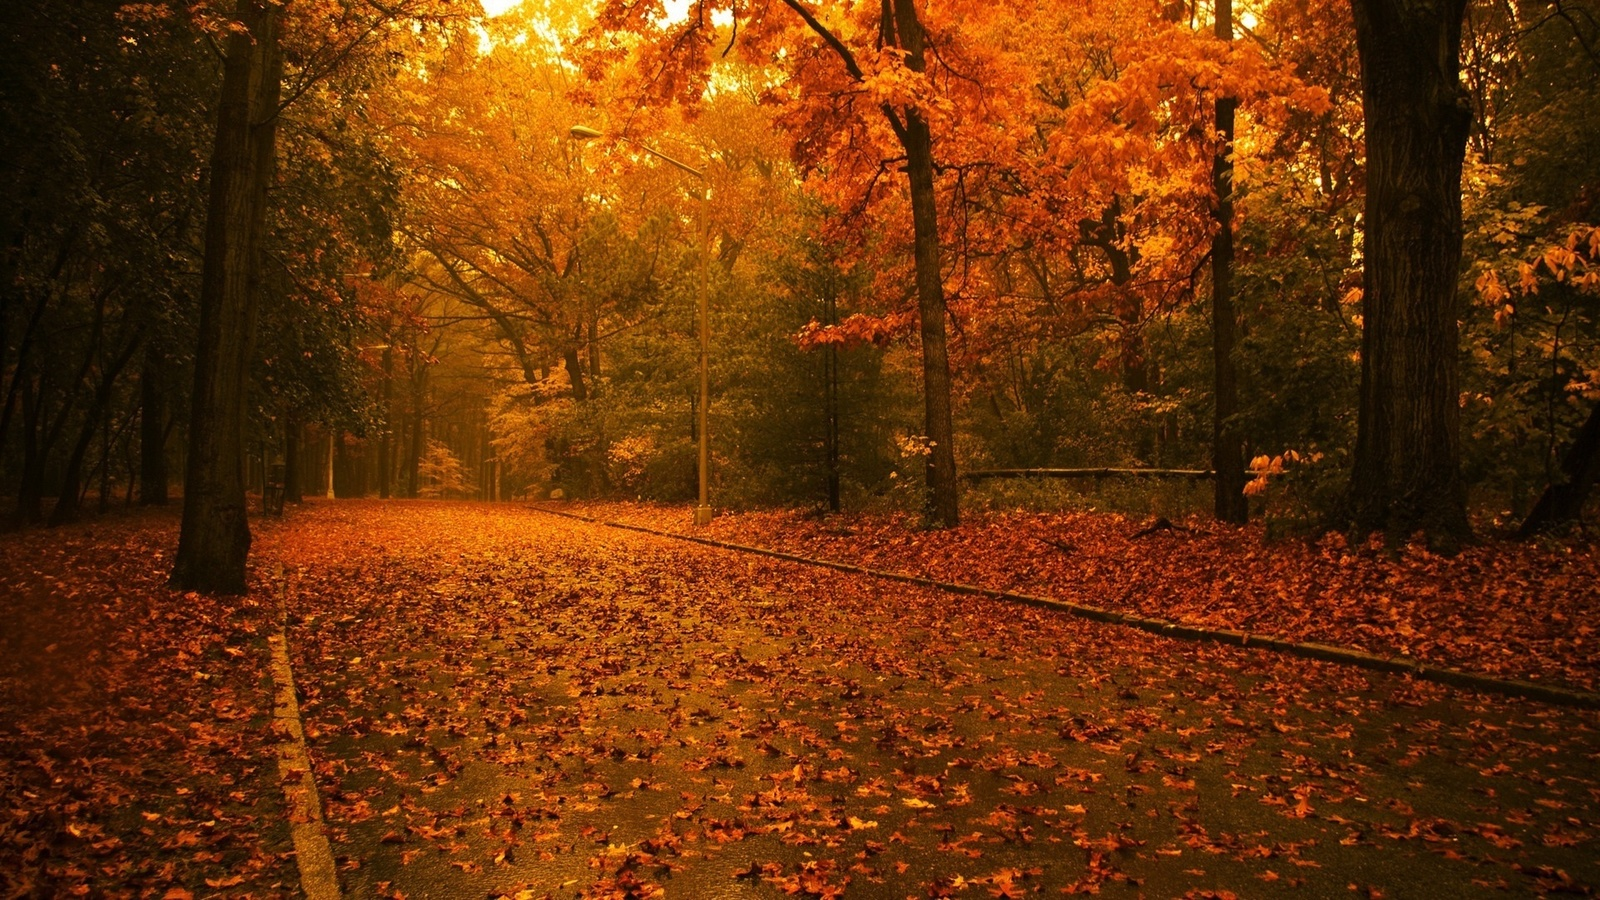 парк, аллея, листва на земле, природа